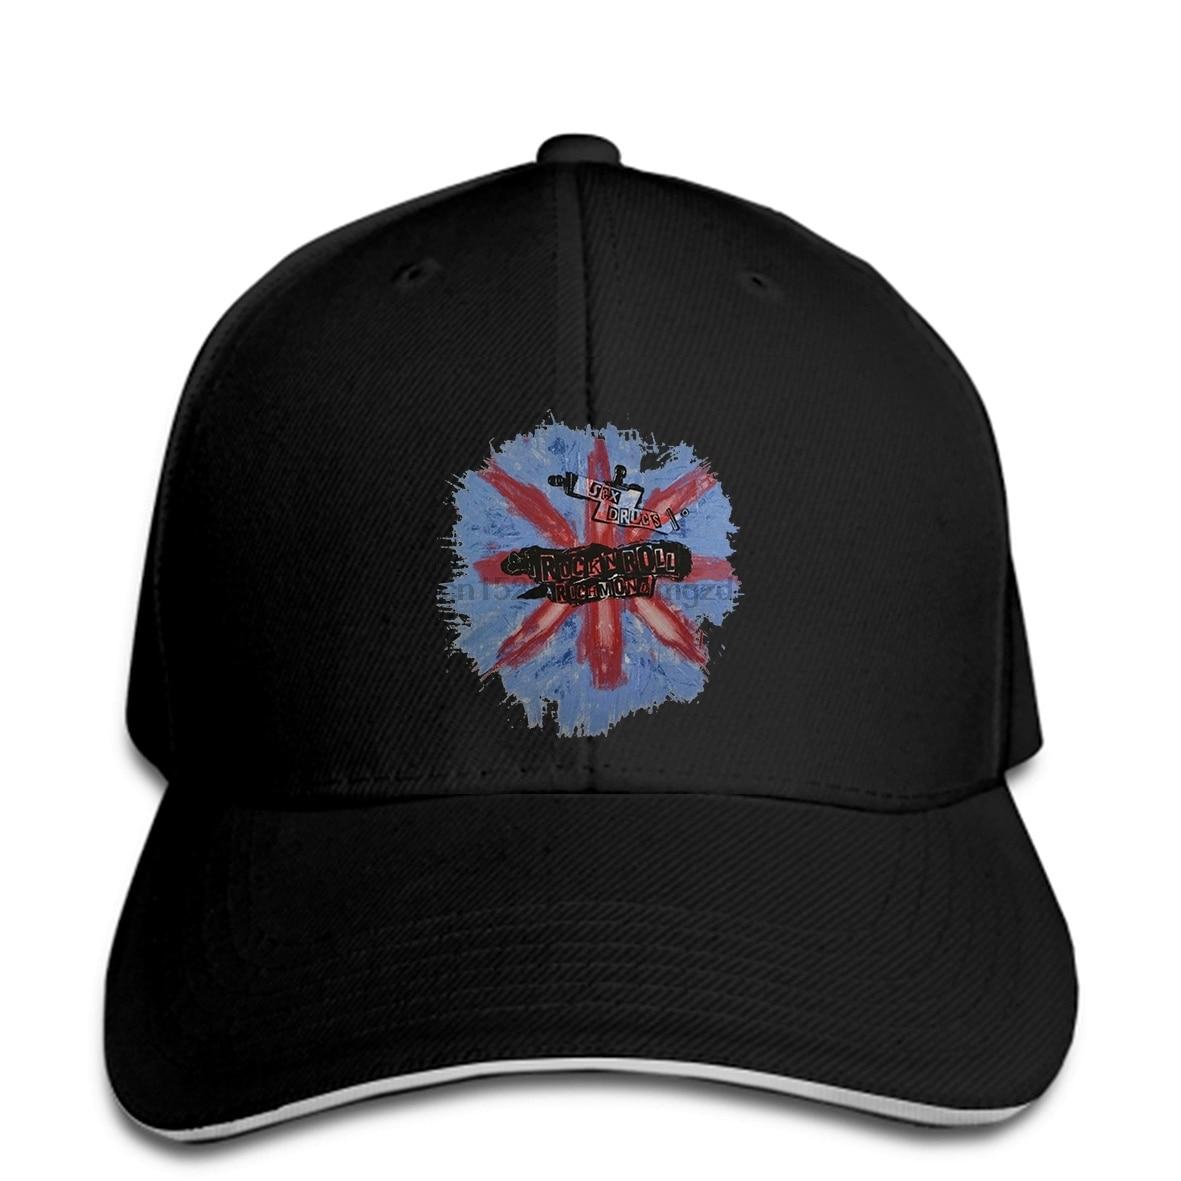 Gorra de béisbol para hombres, gorra de Jack Gr. whlbar, gorra de béisbol para mujer, con un pico